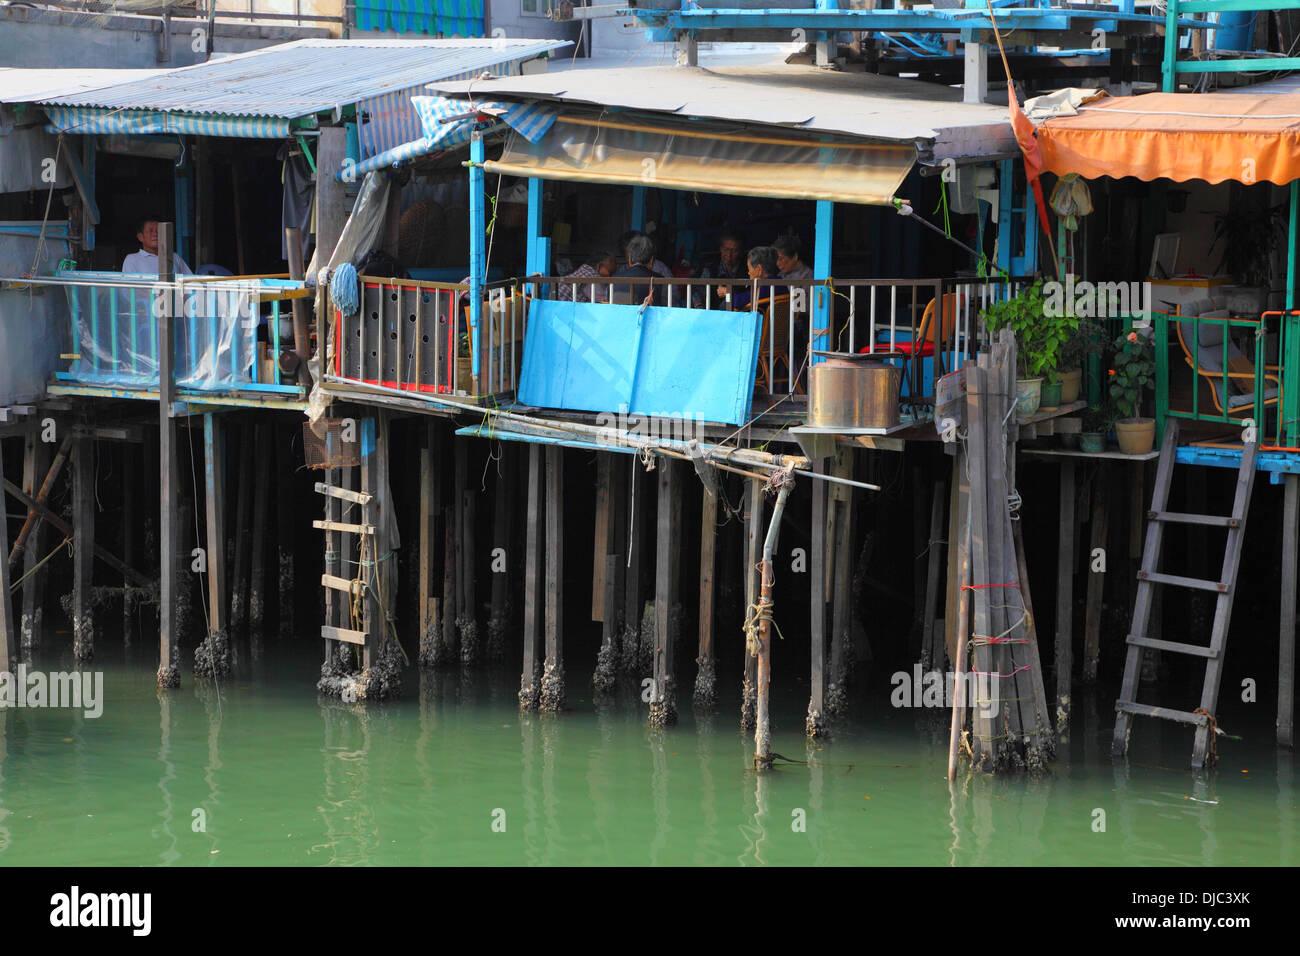 Stilt houses in chinese fishing village Tai O, Hong Kong - Stock Image